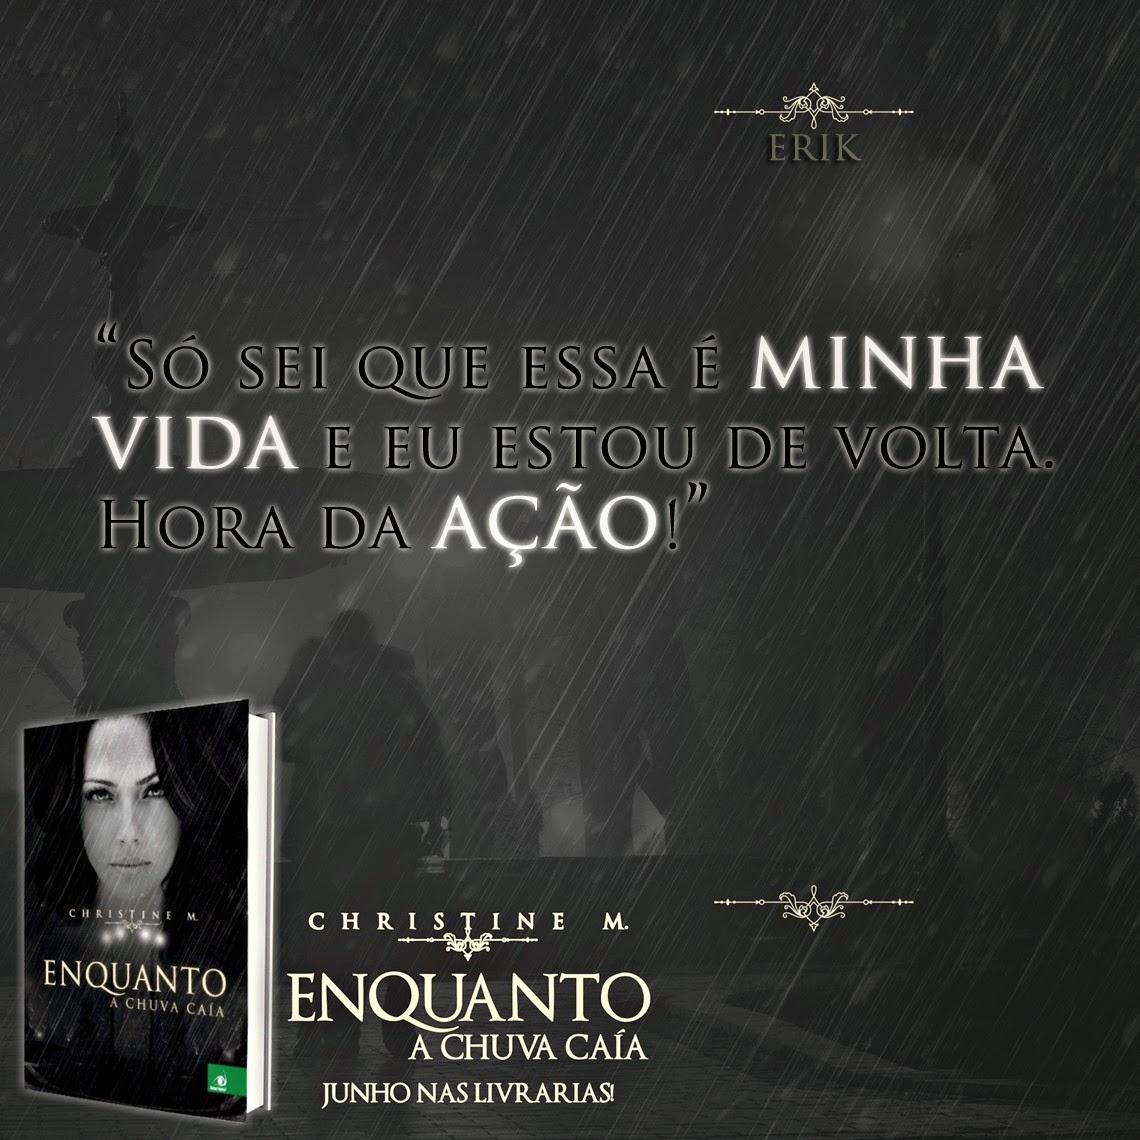 https://www.facebook.com/hashtag/especialenquantoachuvaca%C3%ADa